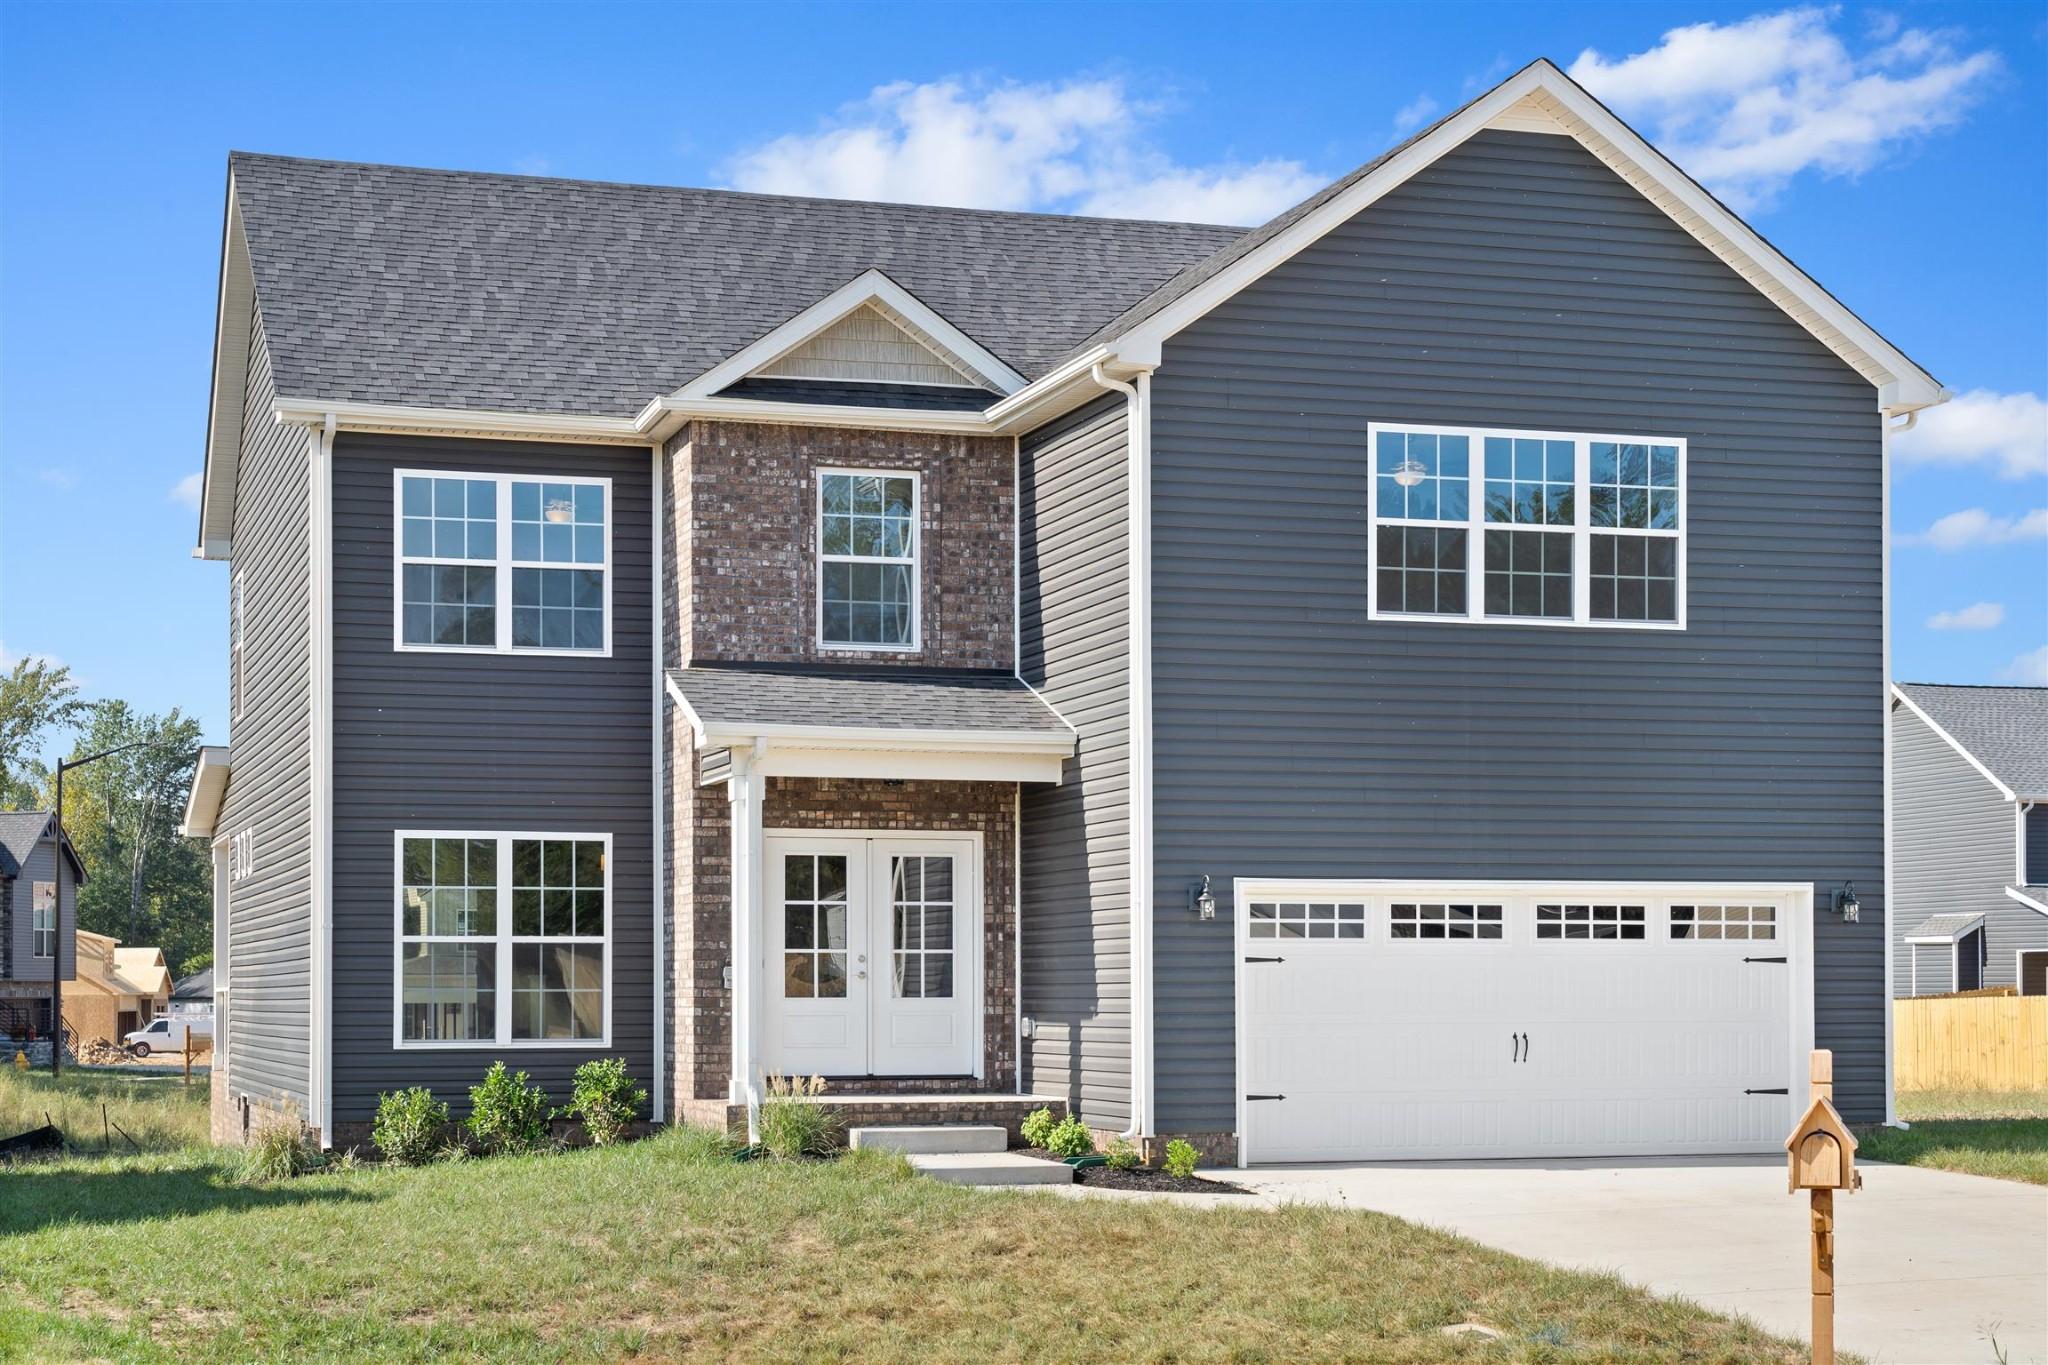 1212 Ewing Way, Clarksville, TN 37043 - Clarksville, TN real estate listing